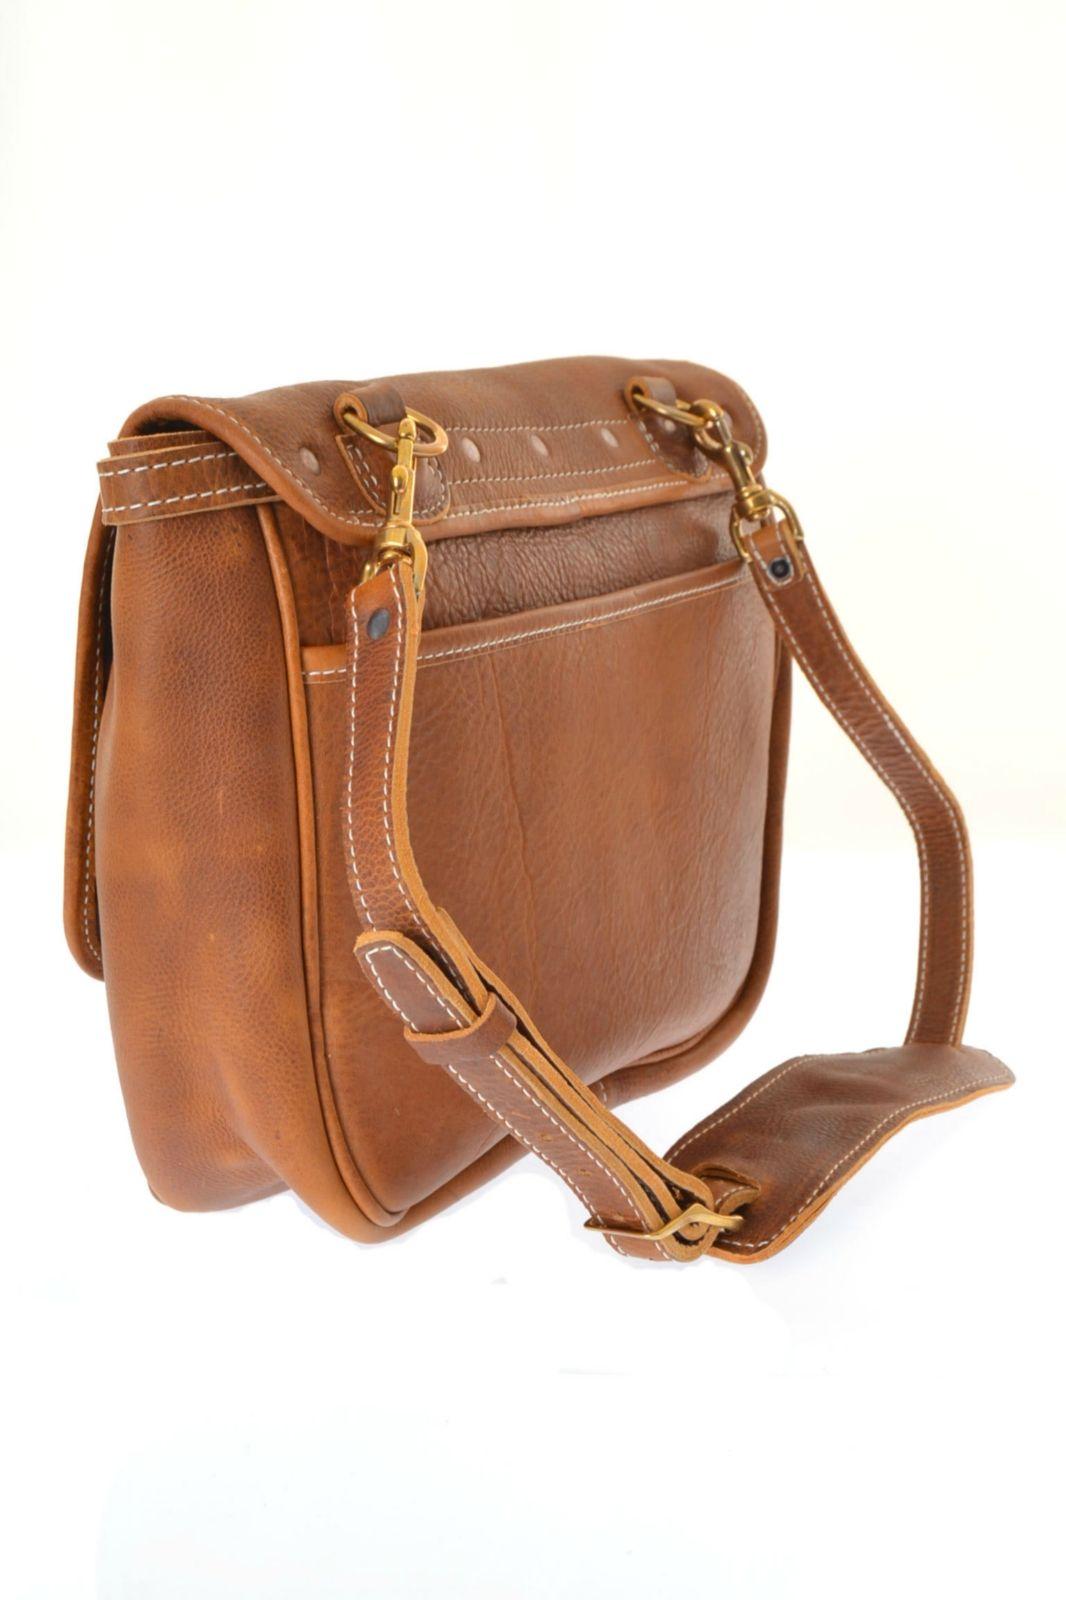 Mailman Bag Peanut - Yuketen  a5a9051b5e315